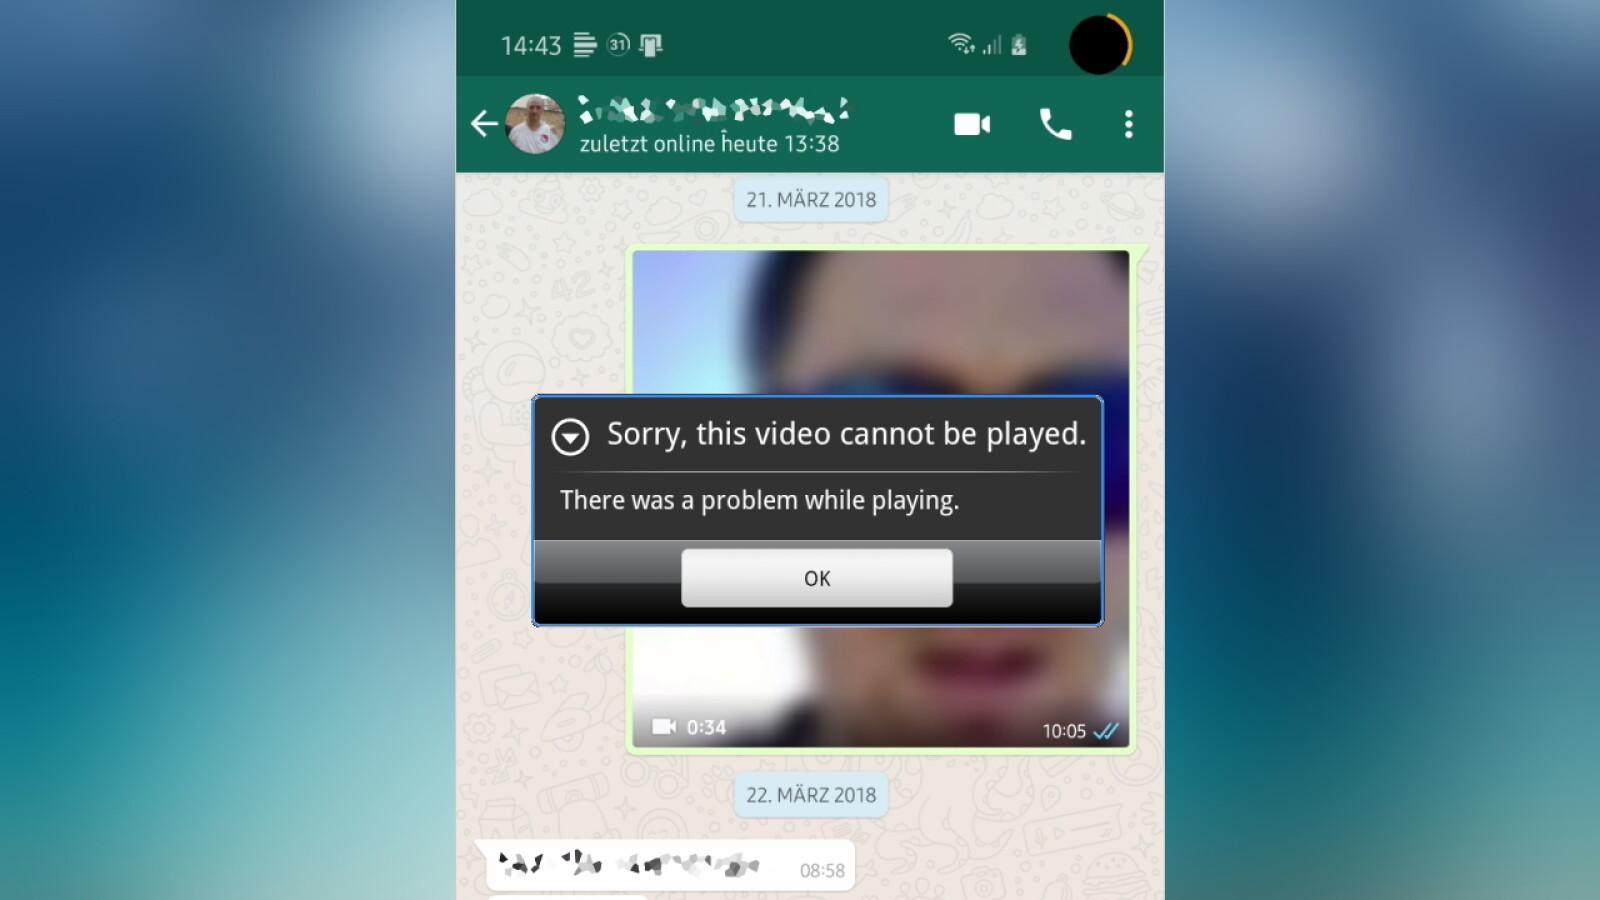 Gesehen oft status whatsapp wie WhatsApp Status